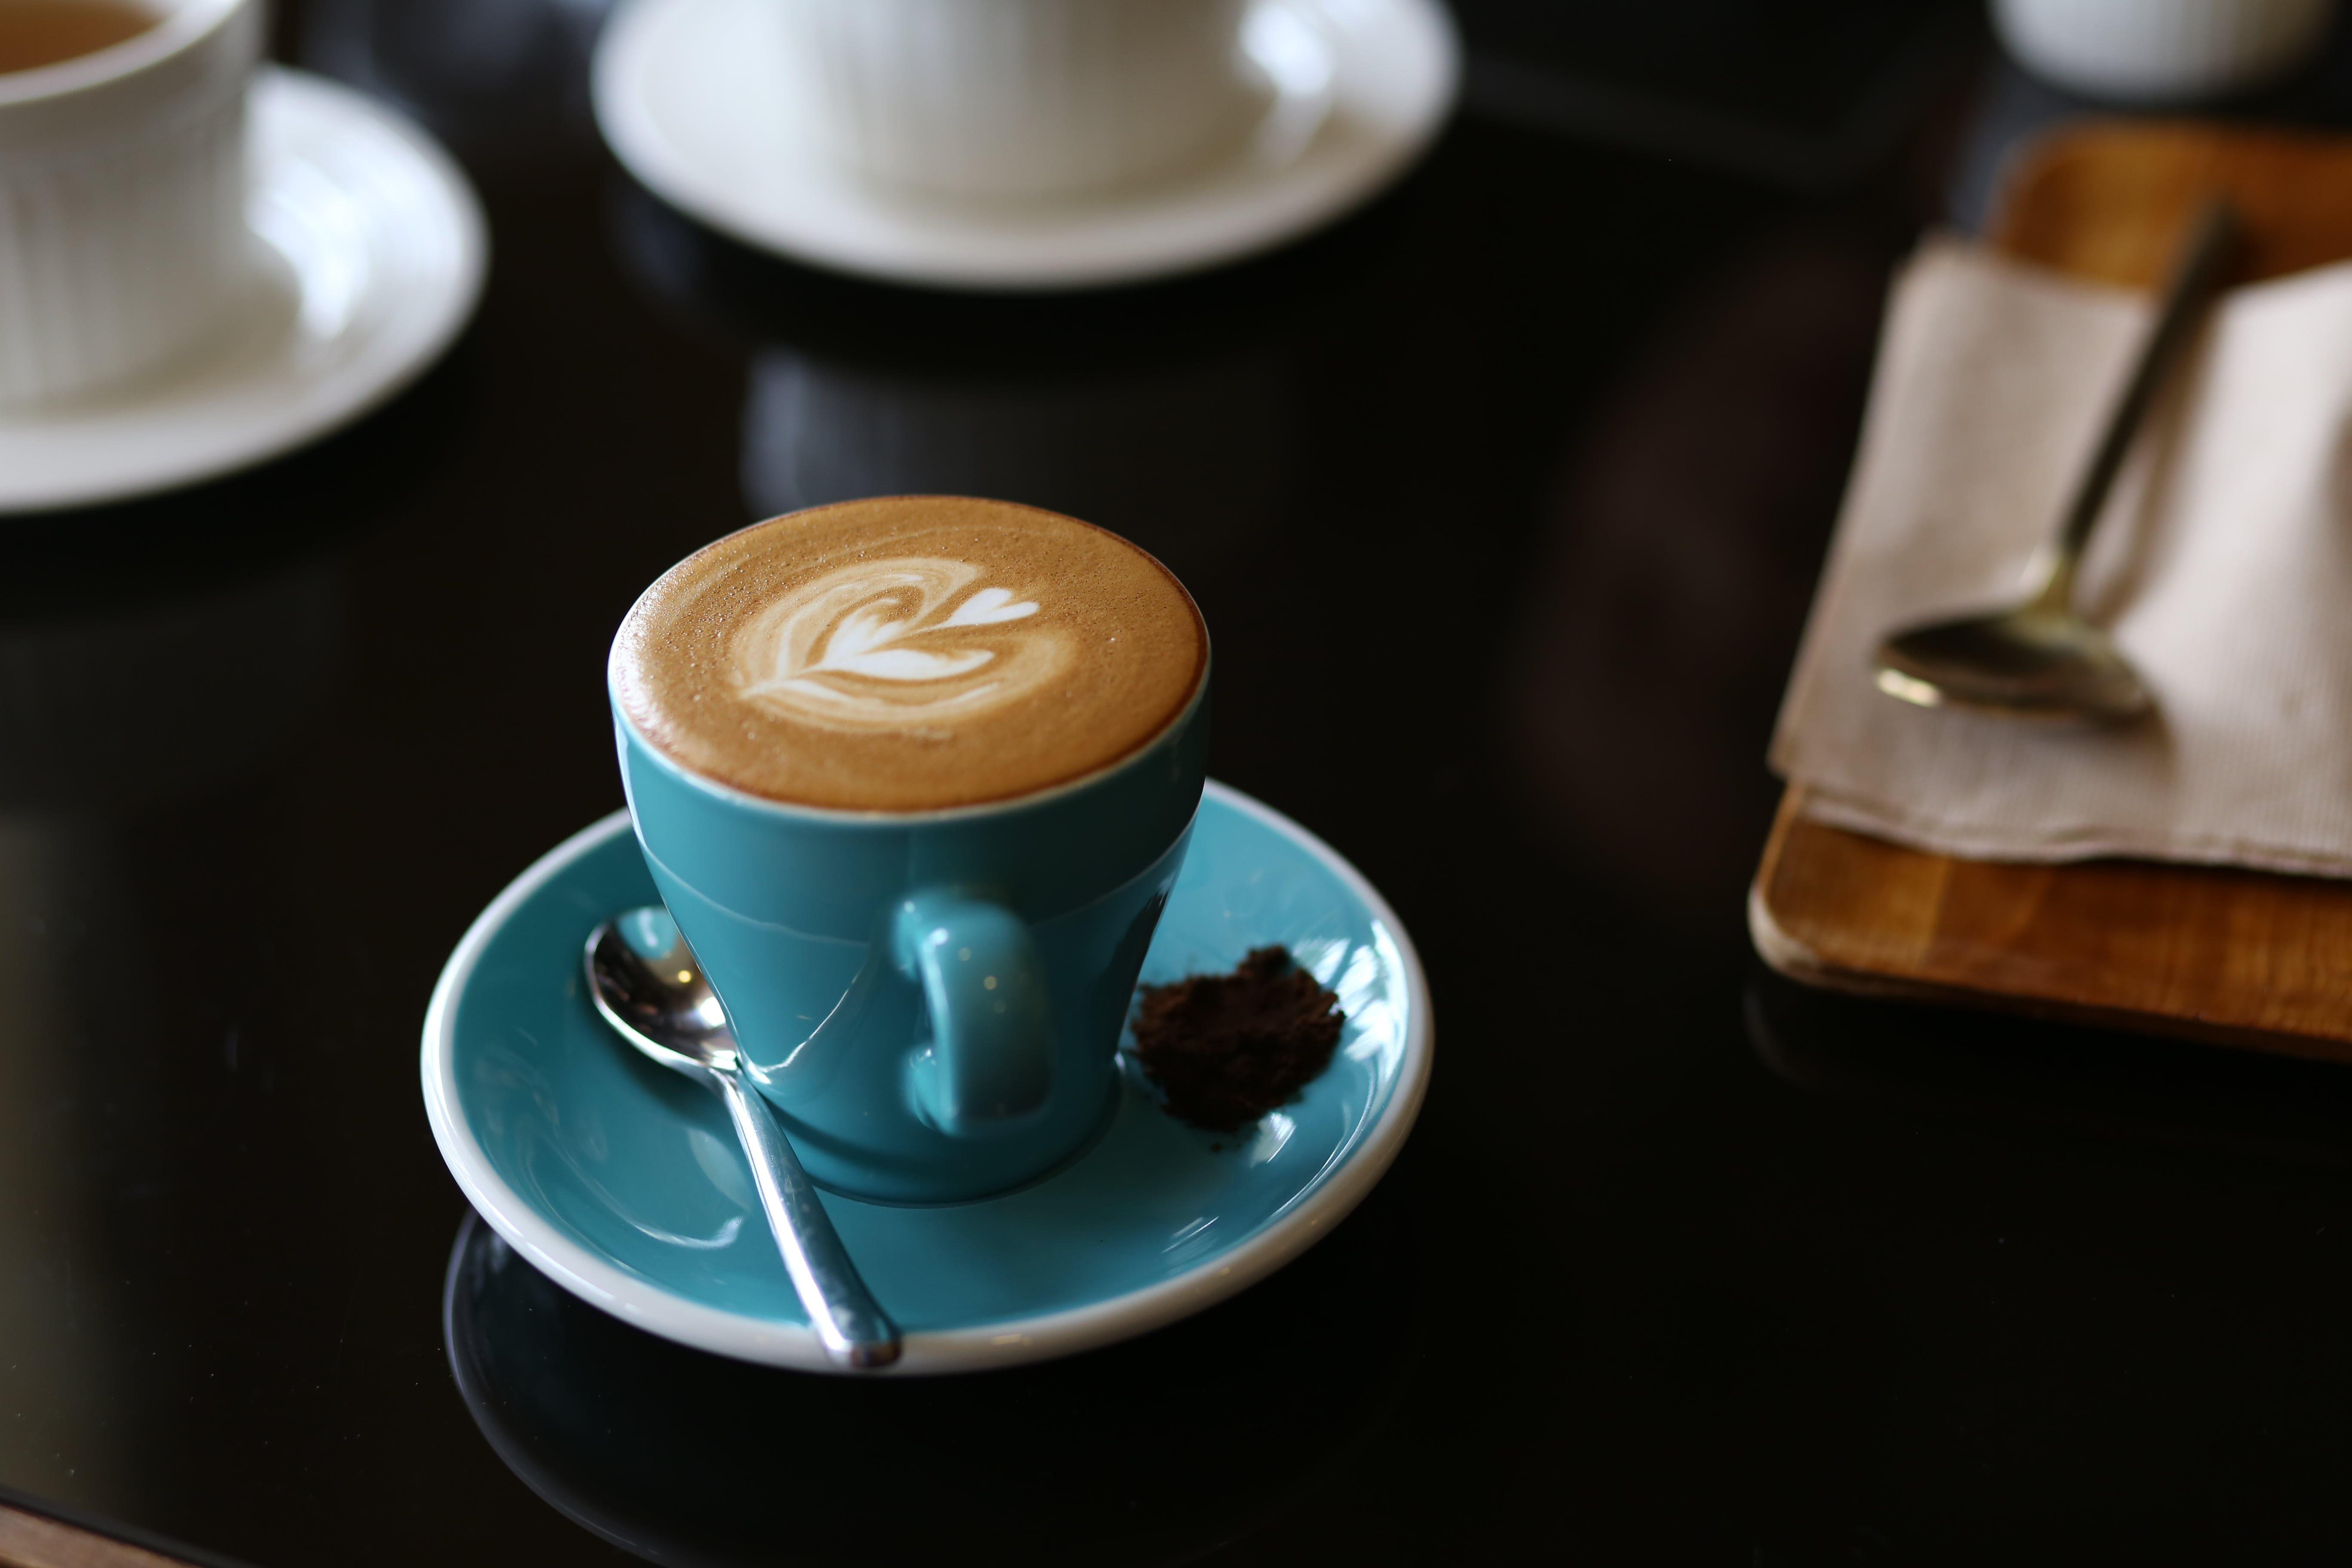 Blue Ceramic Mug Filled With Coffee